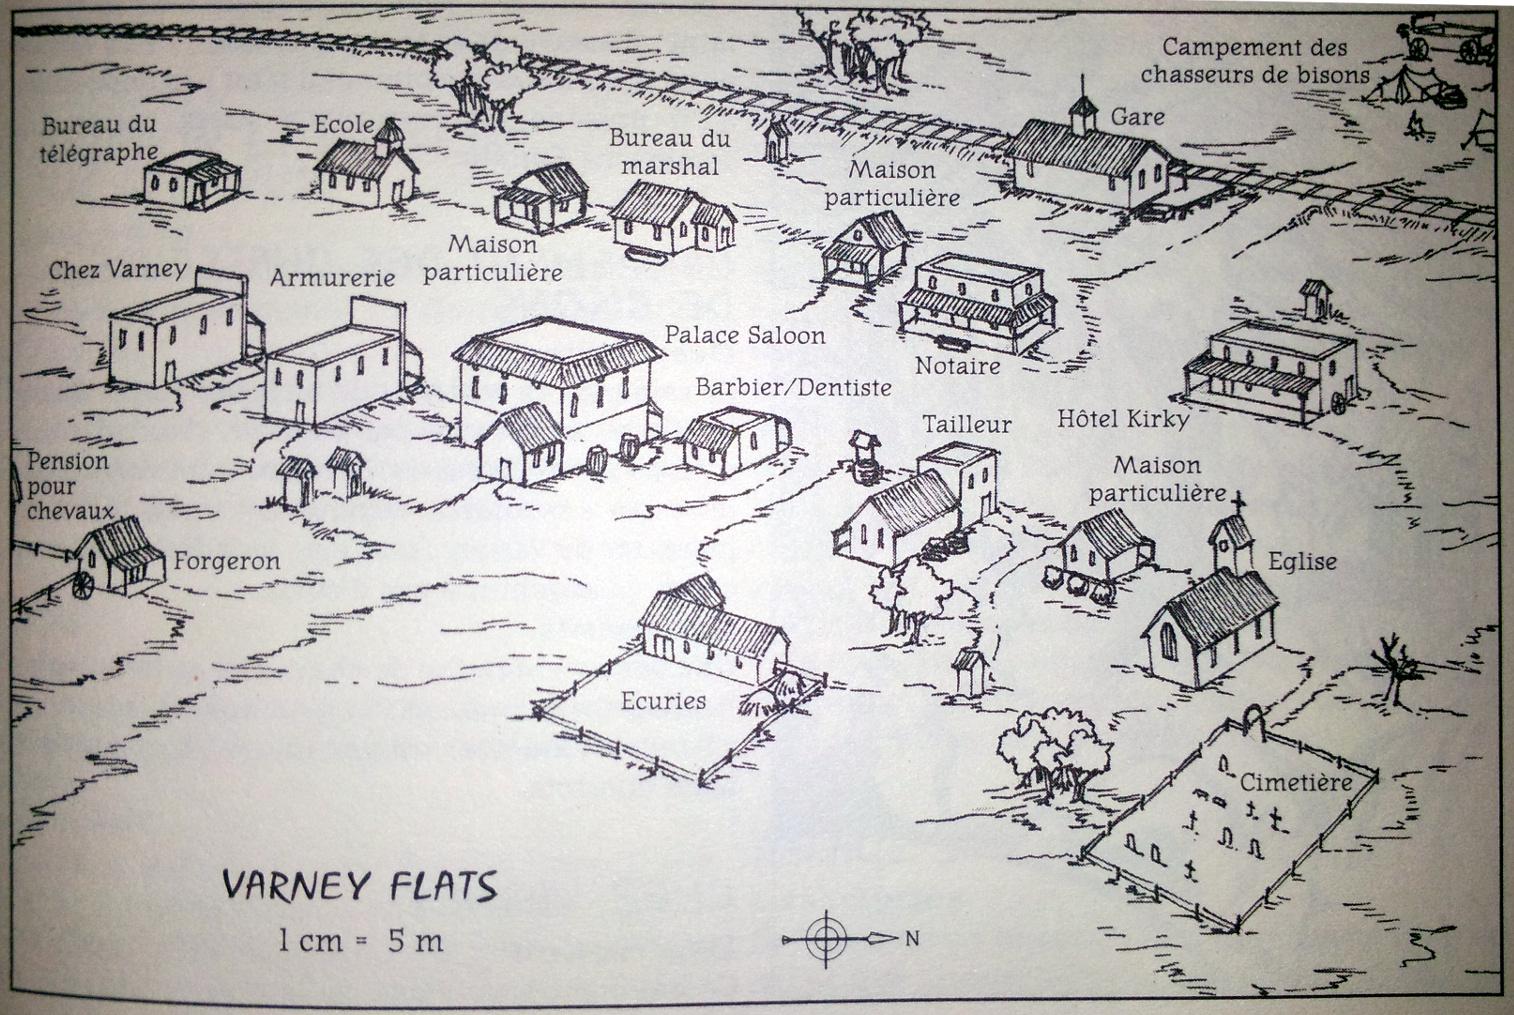 Varney flats